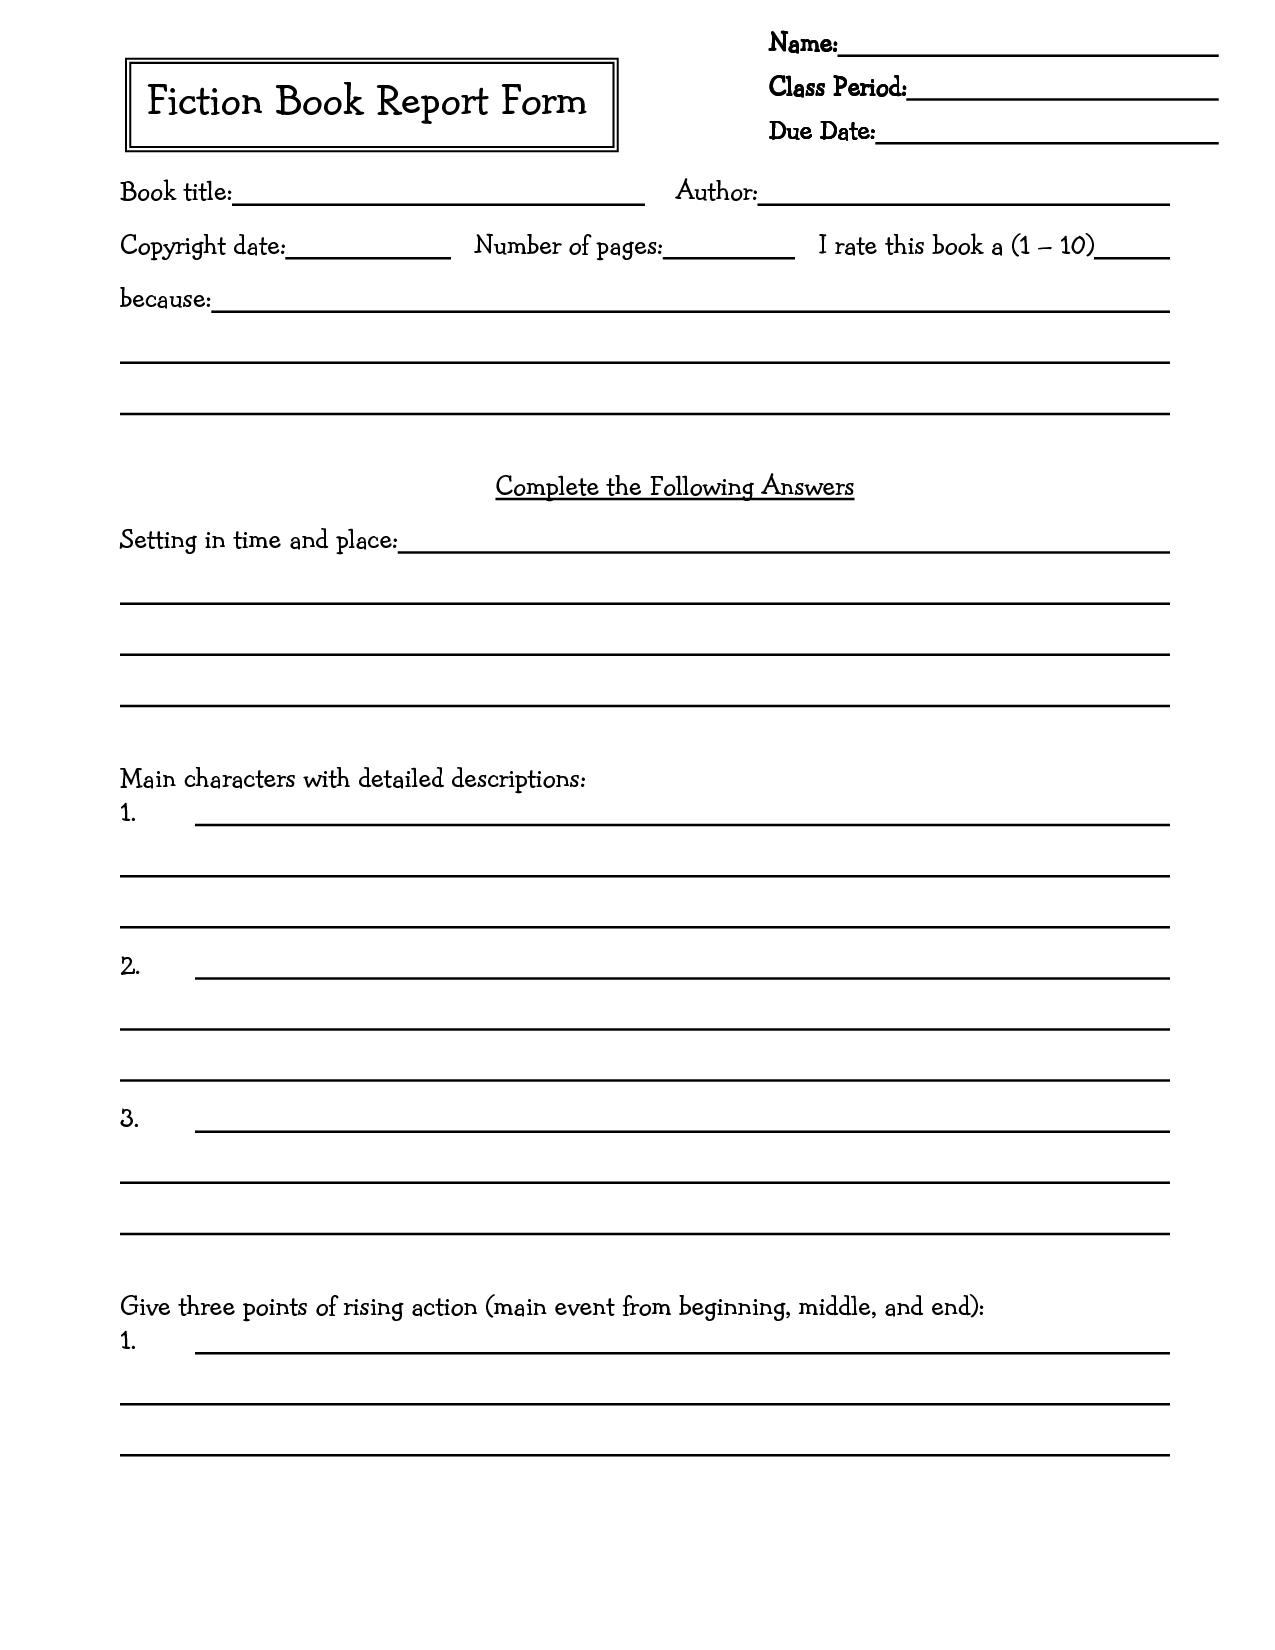 Middle School Book Report Brochure. 6Th Grade | 7Th Grade | 8Th | Book Report Printable Worksheets